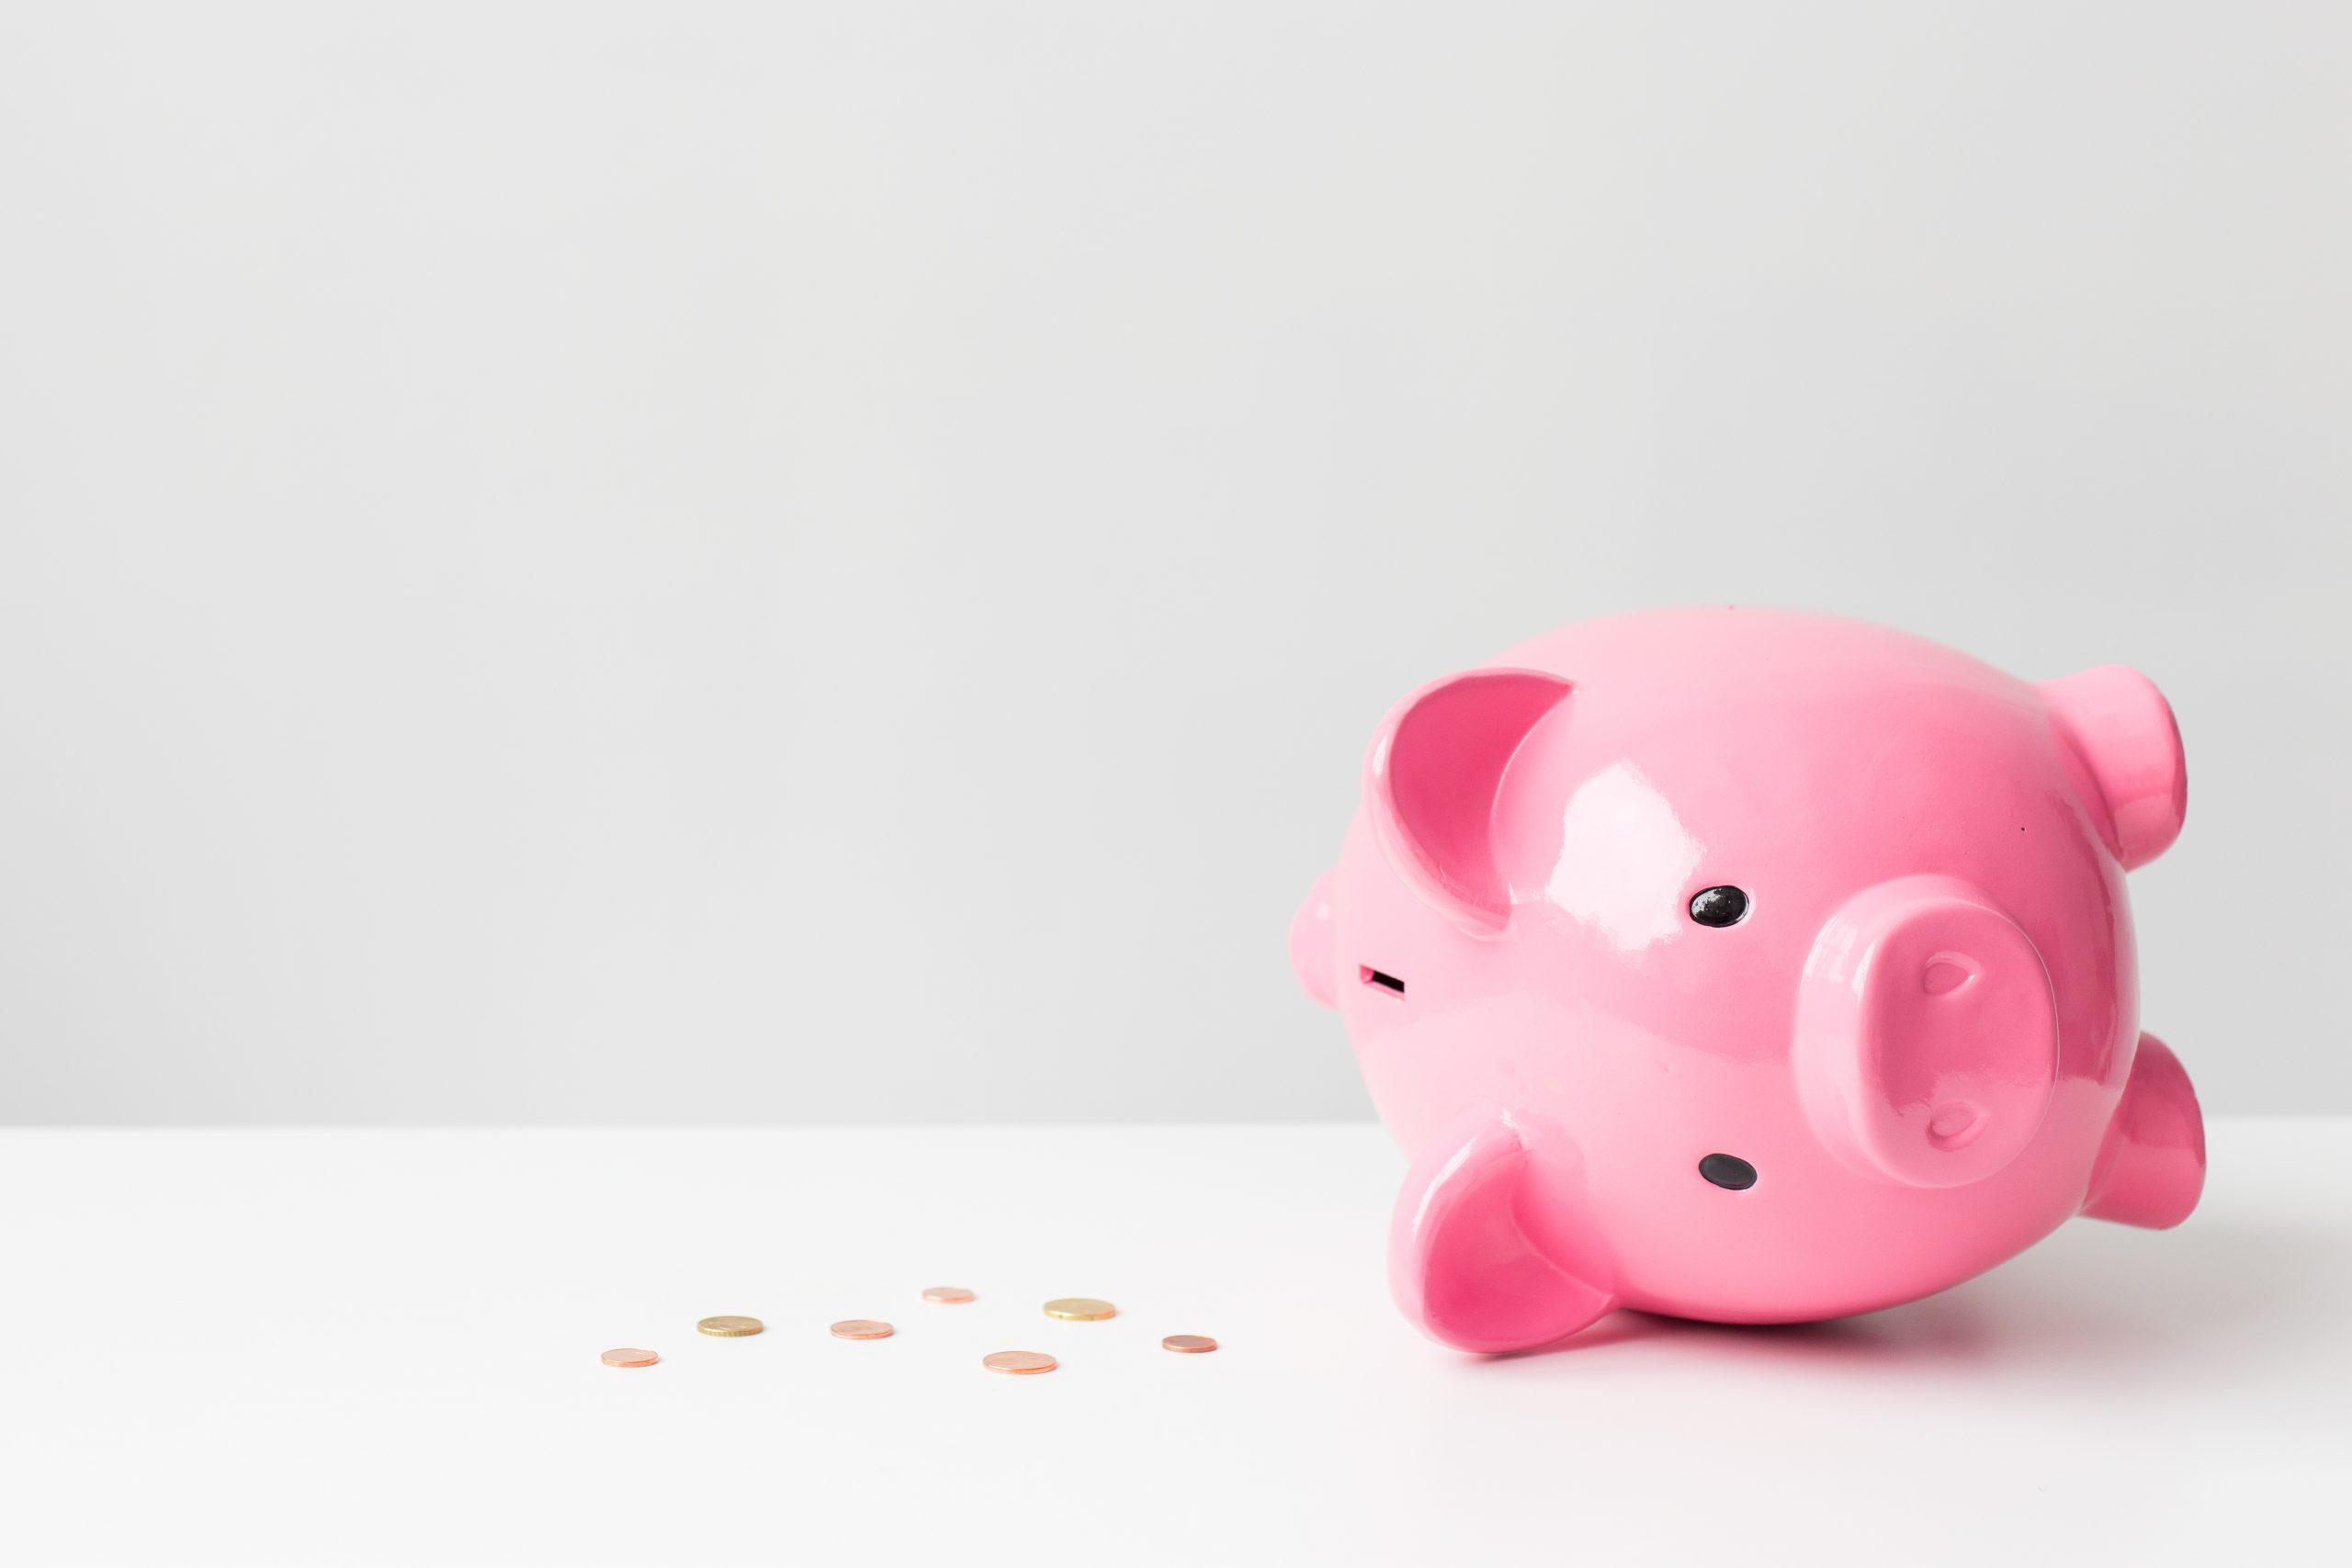 Empty piggy bank